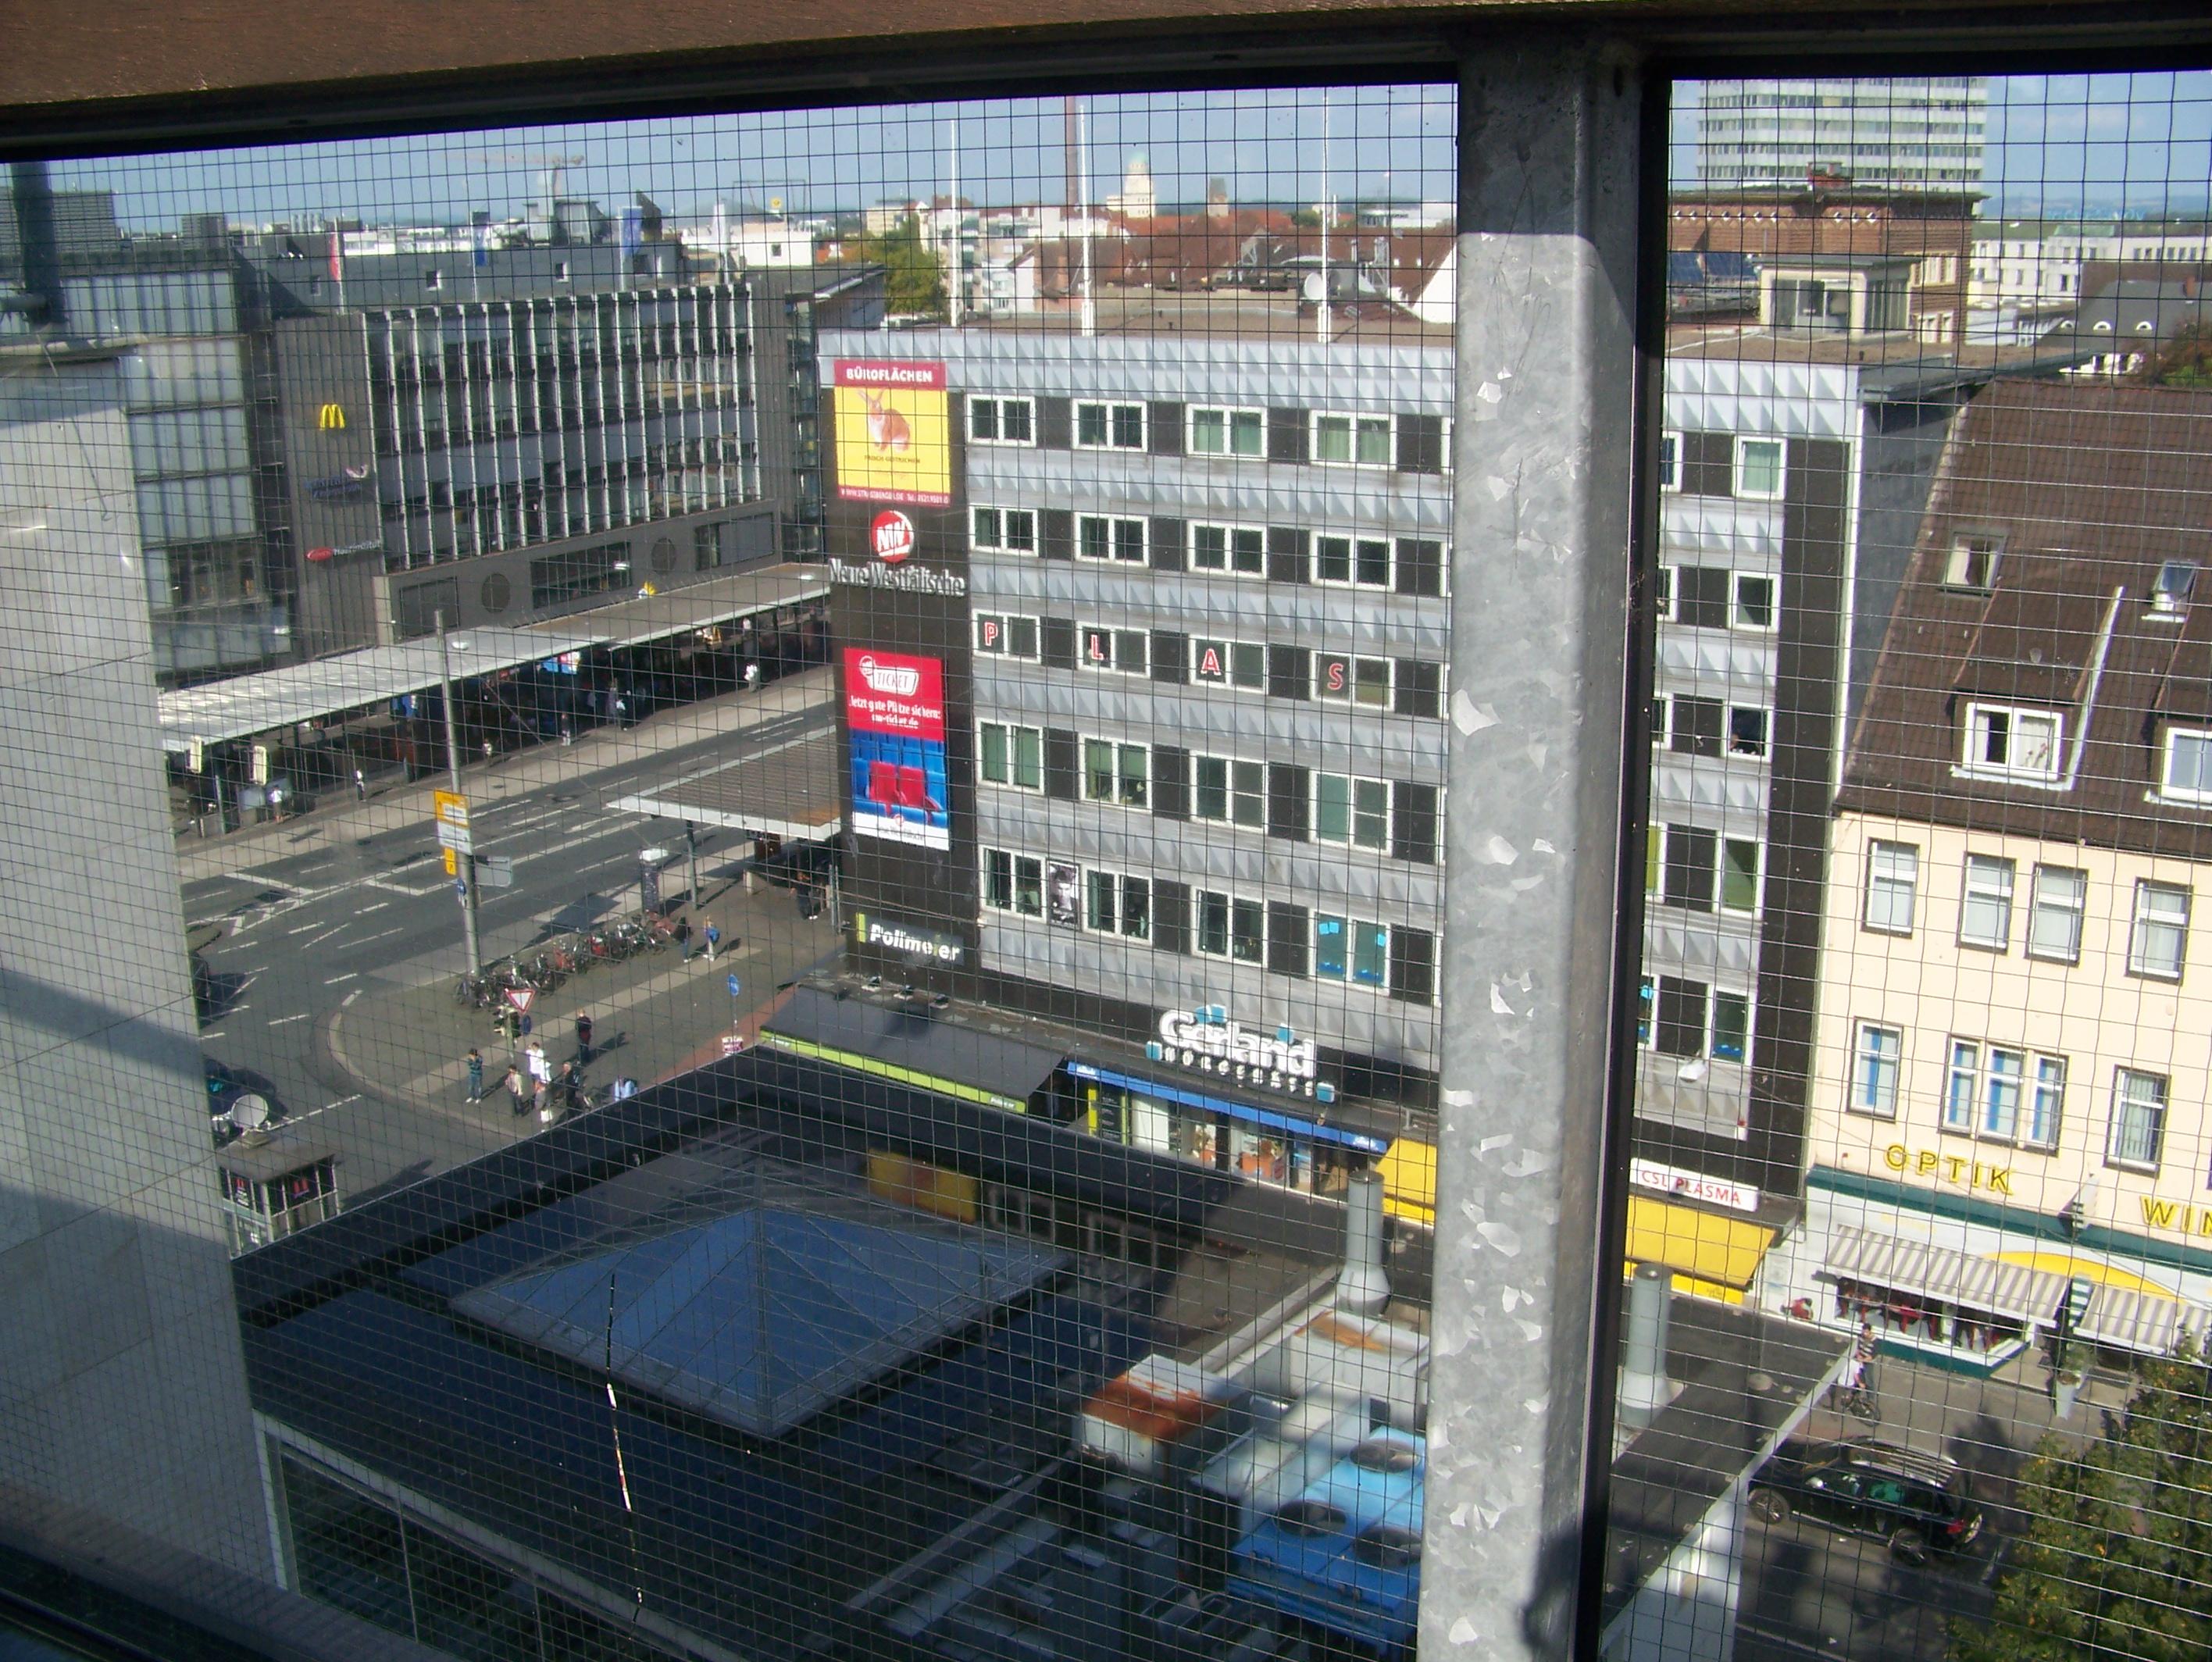 Bielefeld Innenstadt